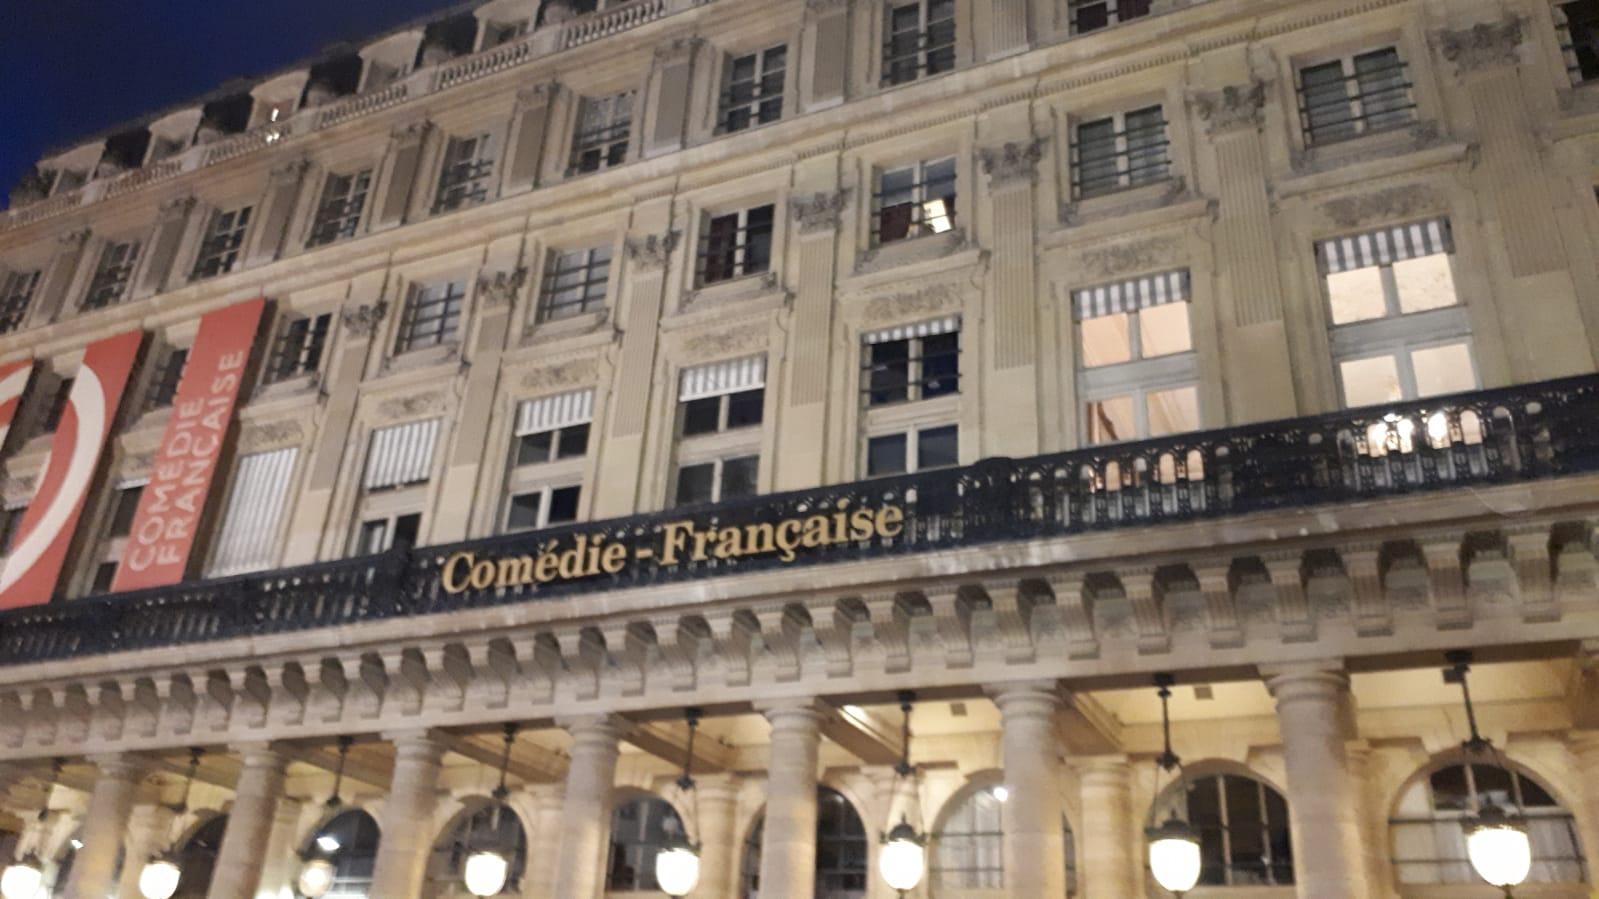 Comedie Francaise Calendrier.Sortie A La Comedie Francaise College Henri Wallon Ivry